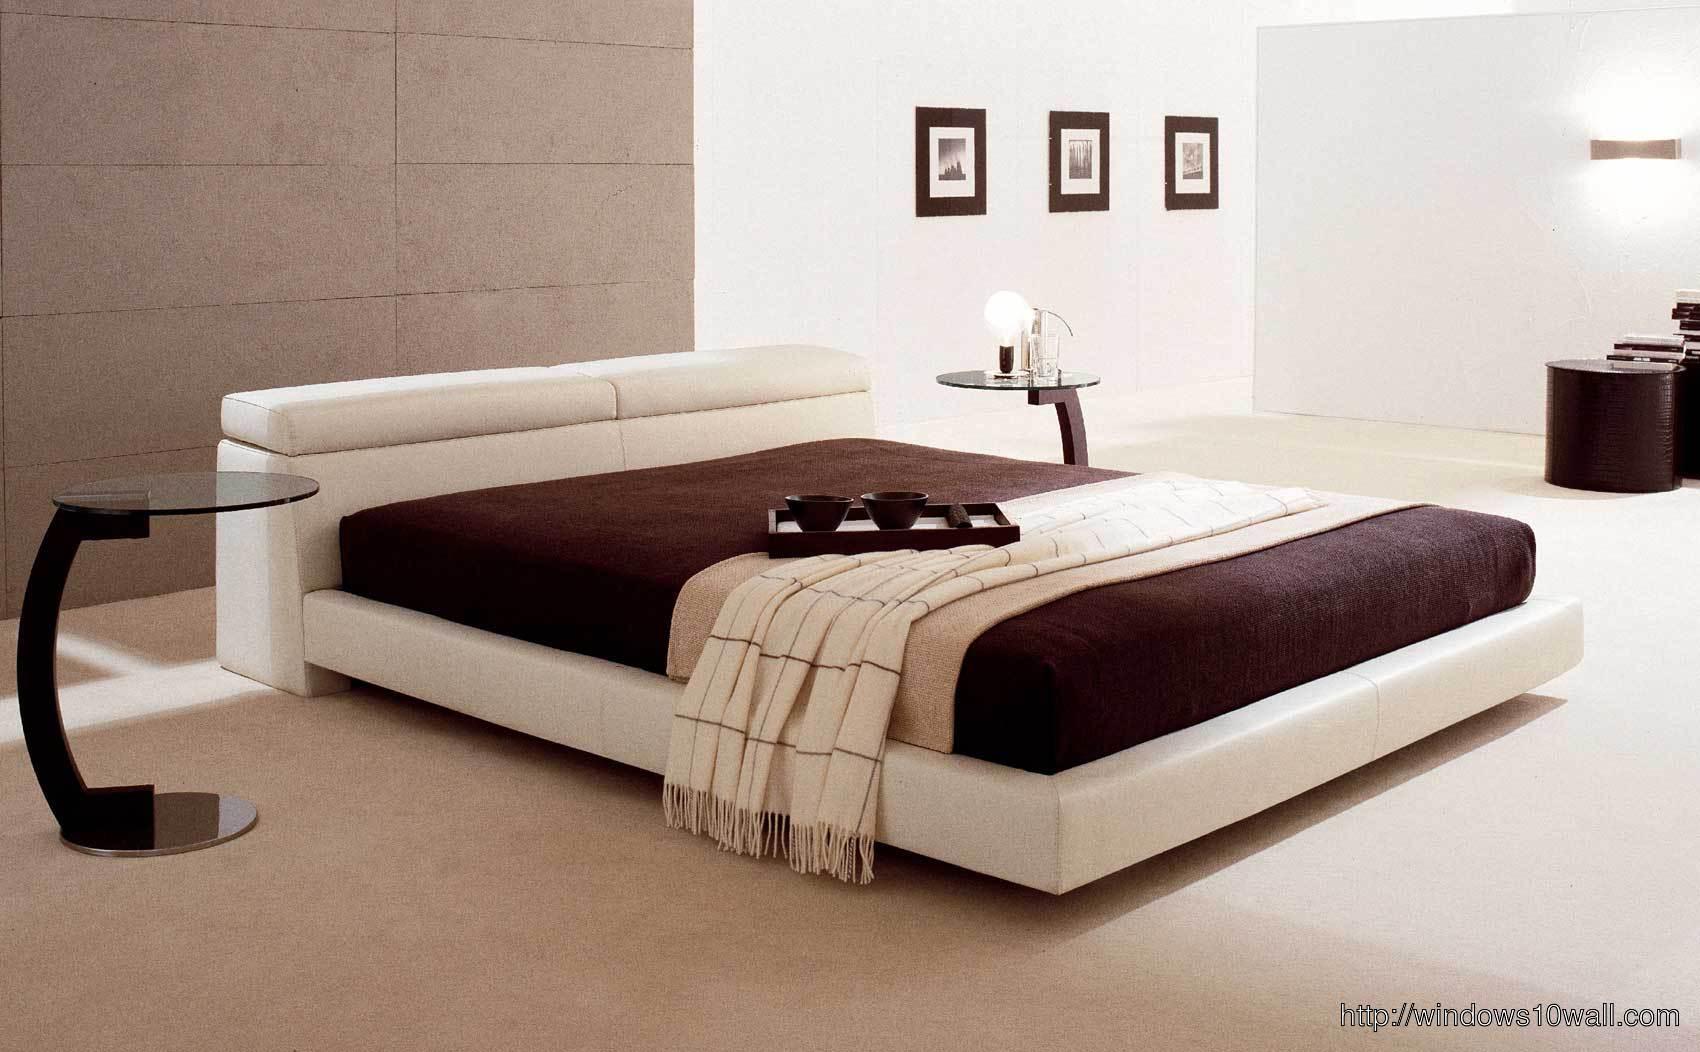 Stunning Modern Master Bedroom Design Background Wallpaper